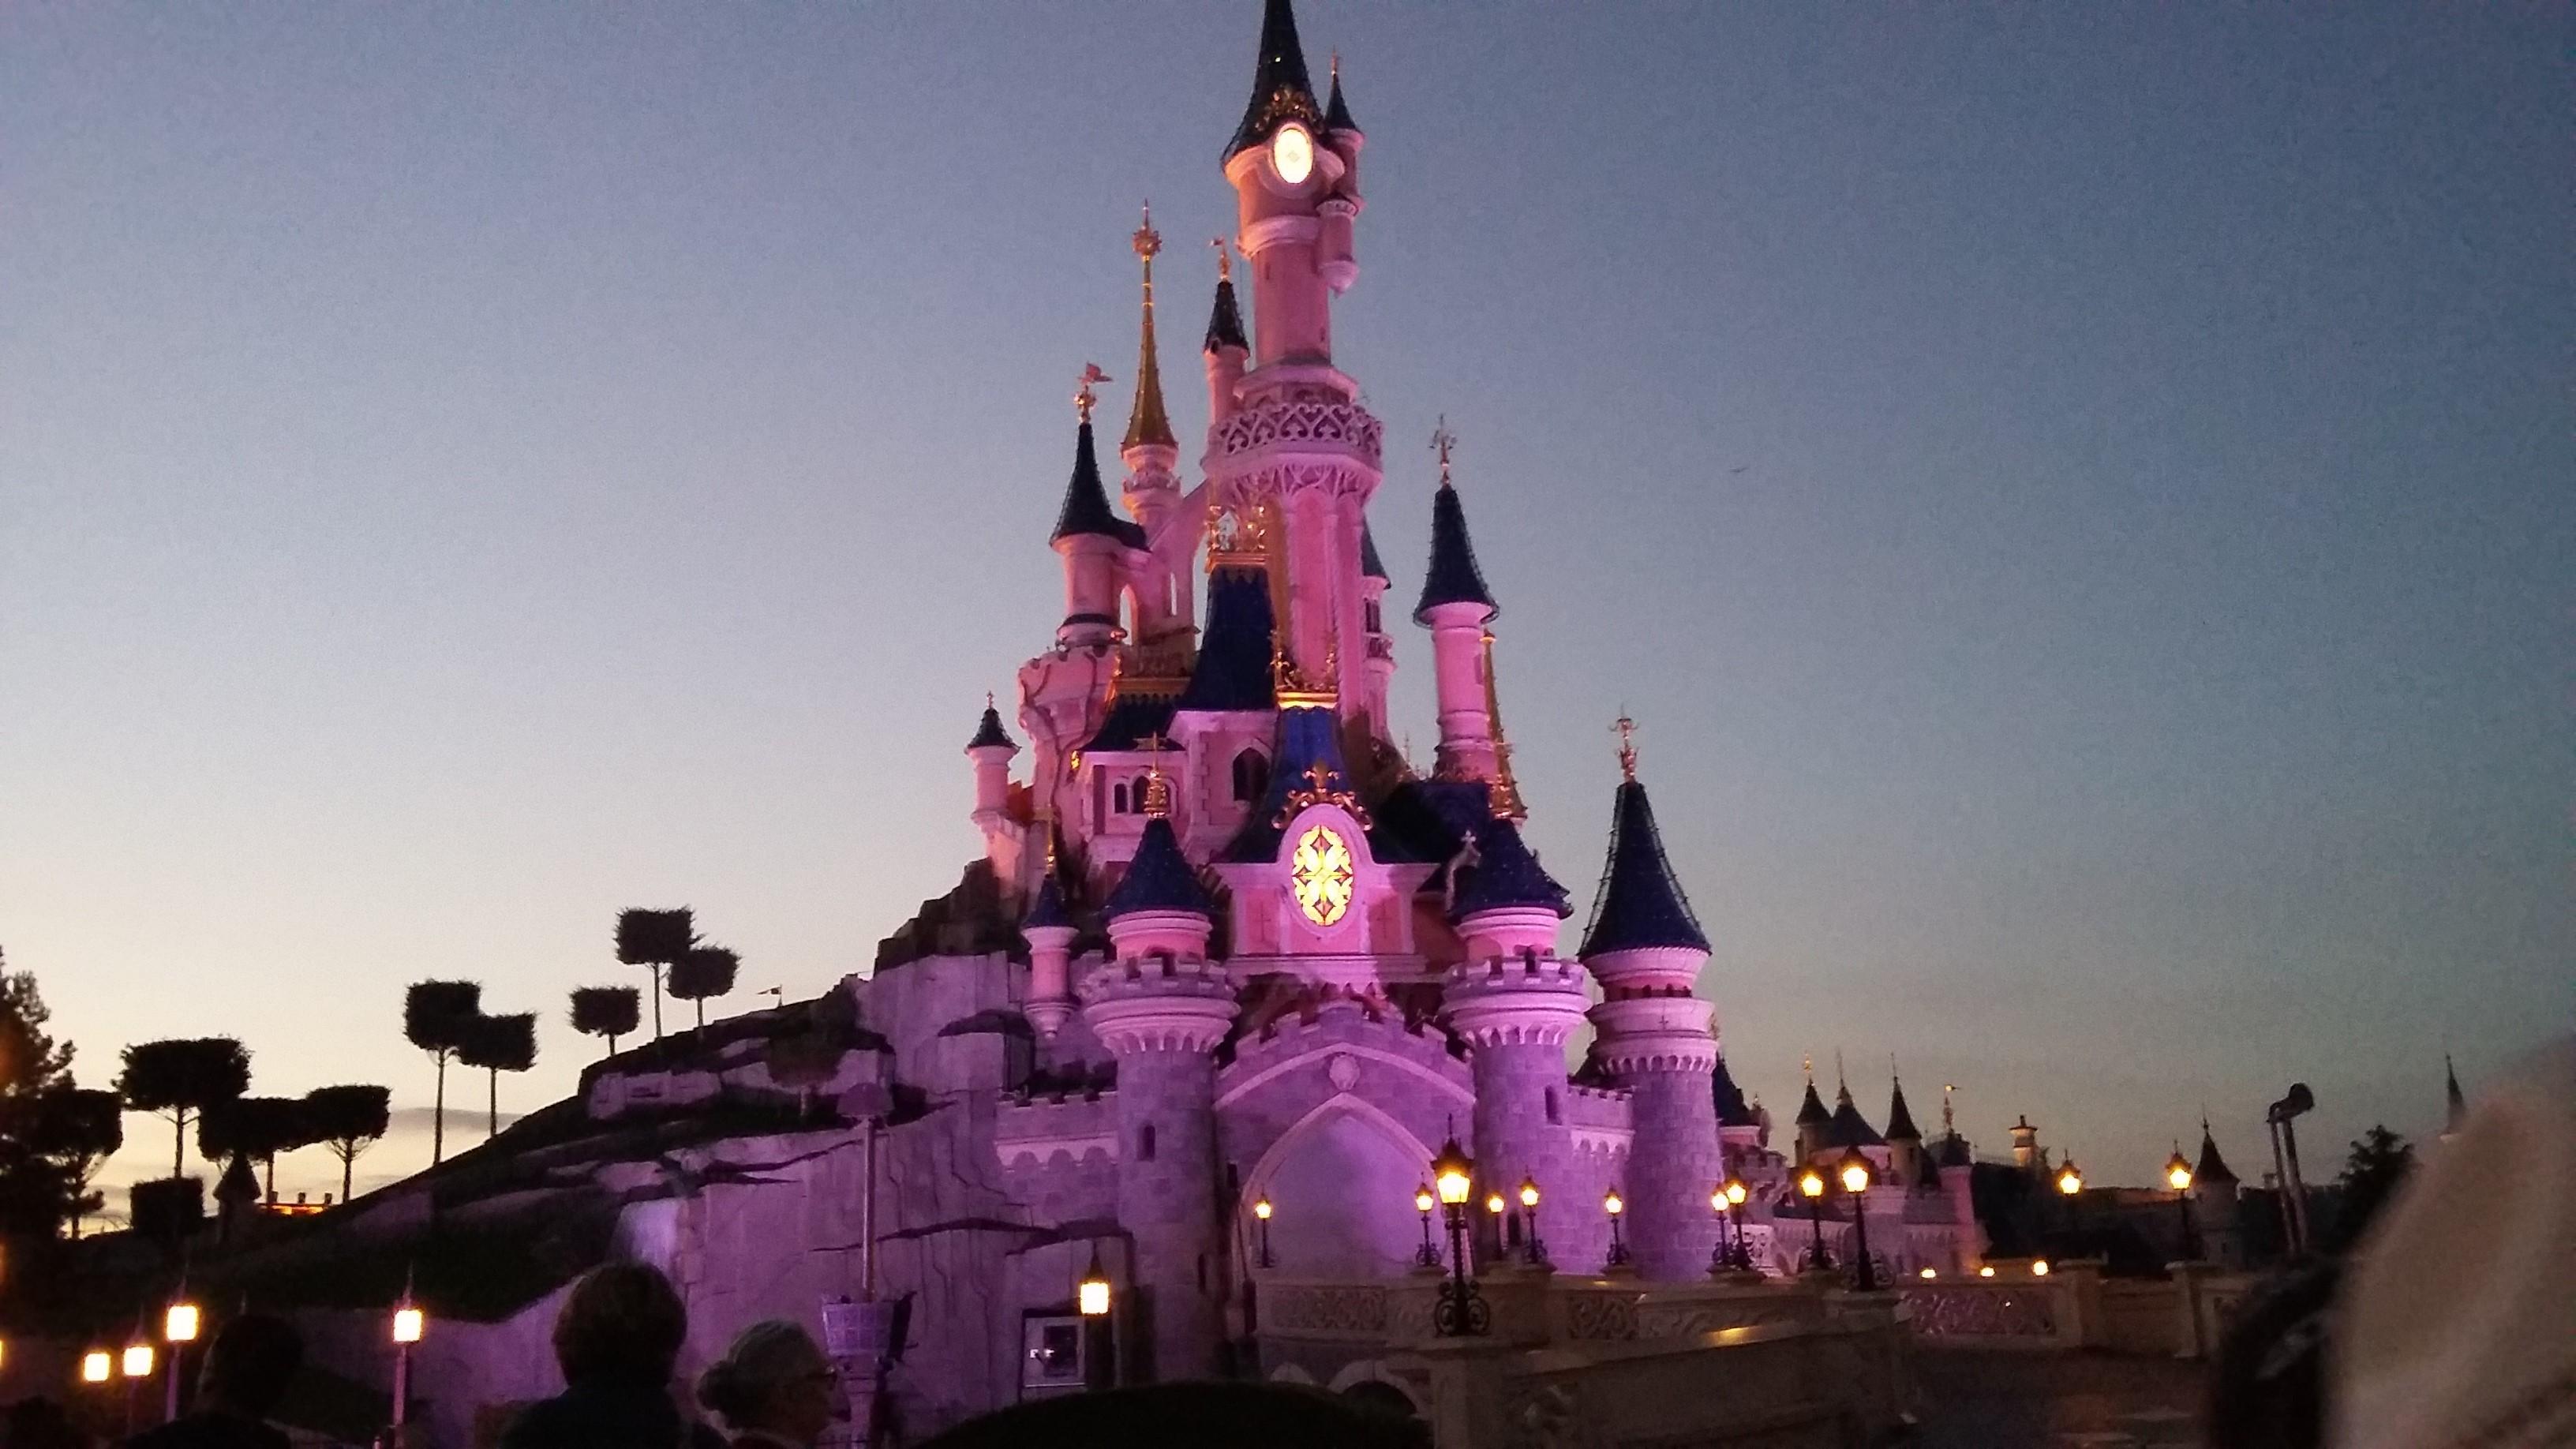 castell de nit